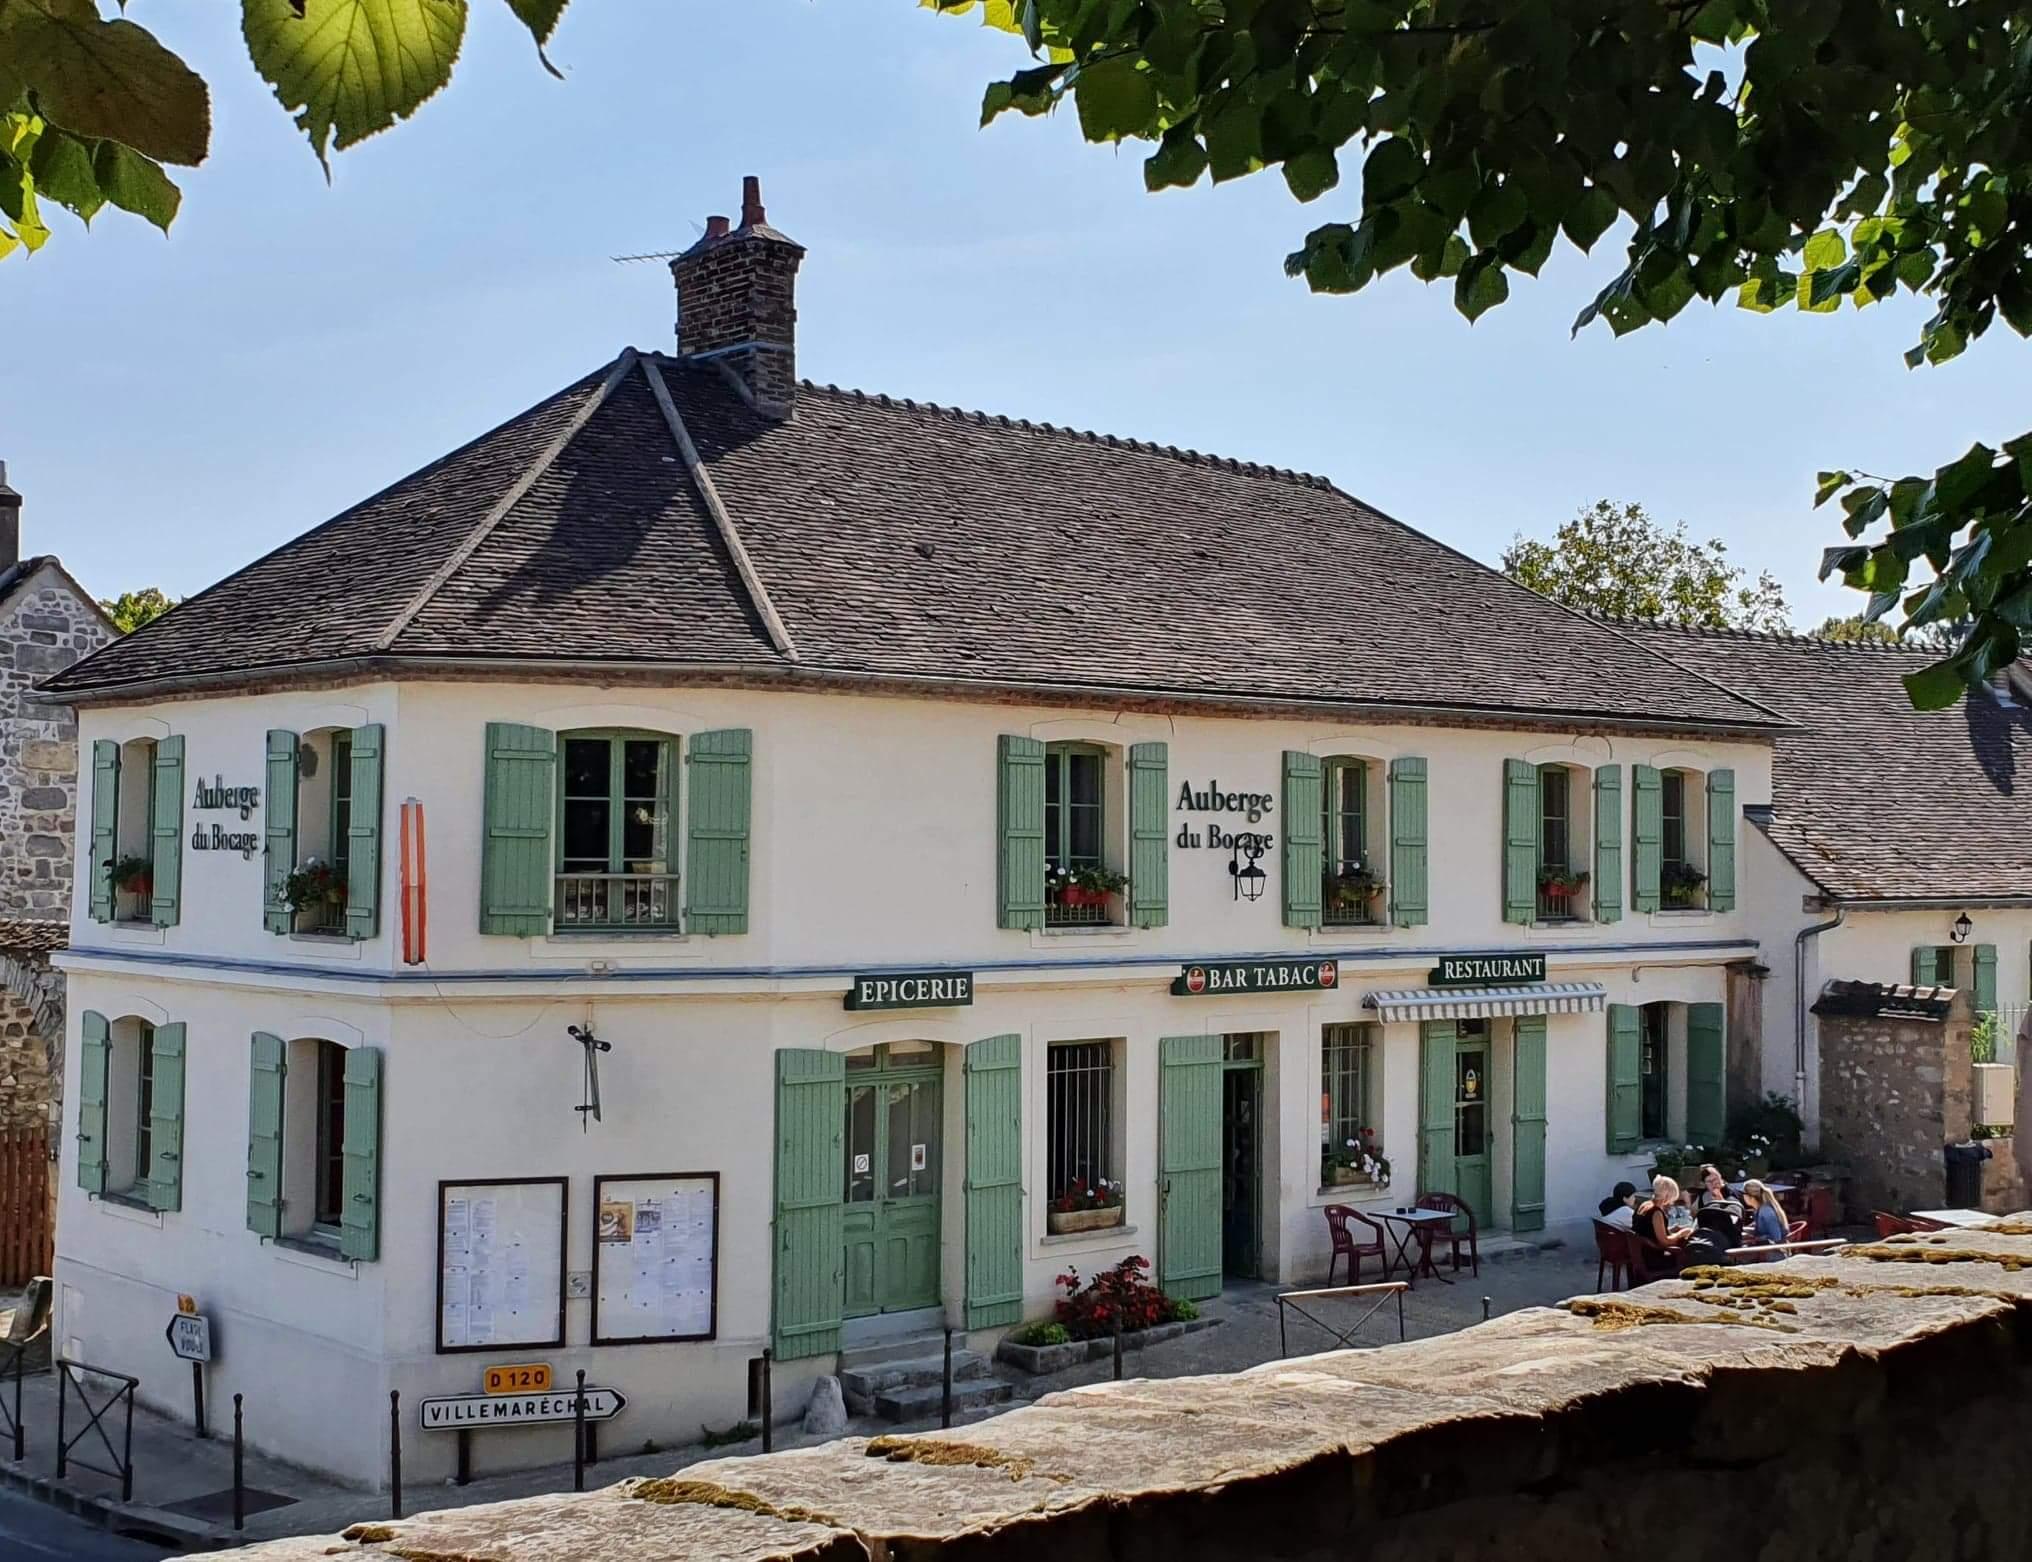 Auberge du Bocage